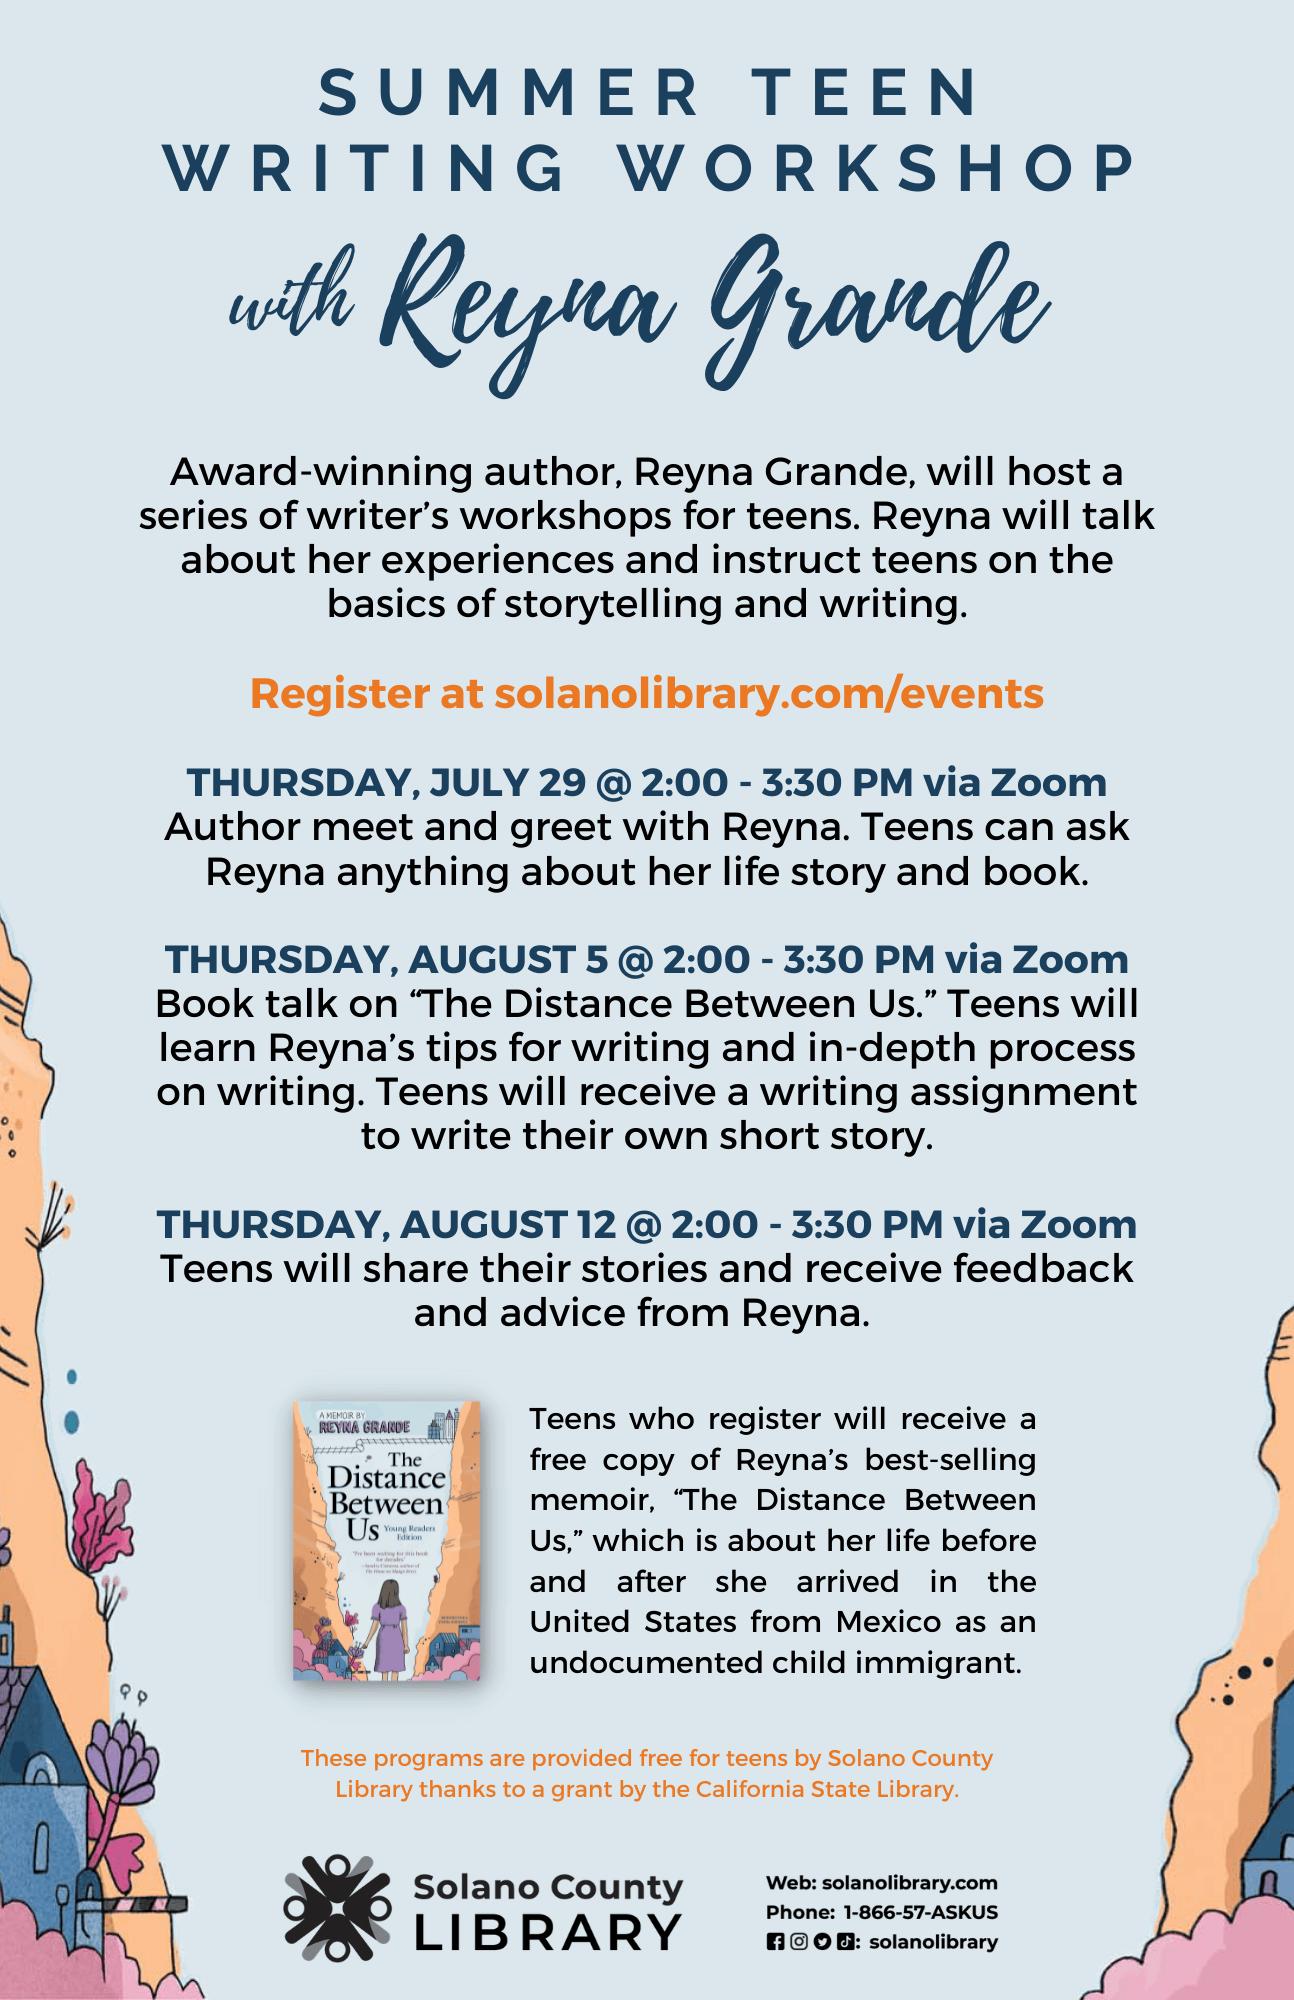 Summer Teen Writing Workshop With Reyna Grande Program